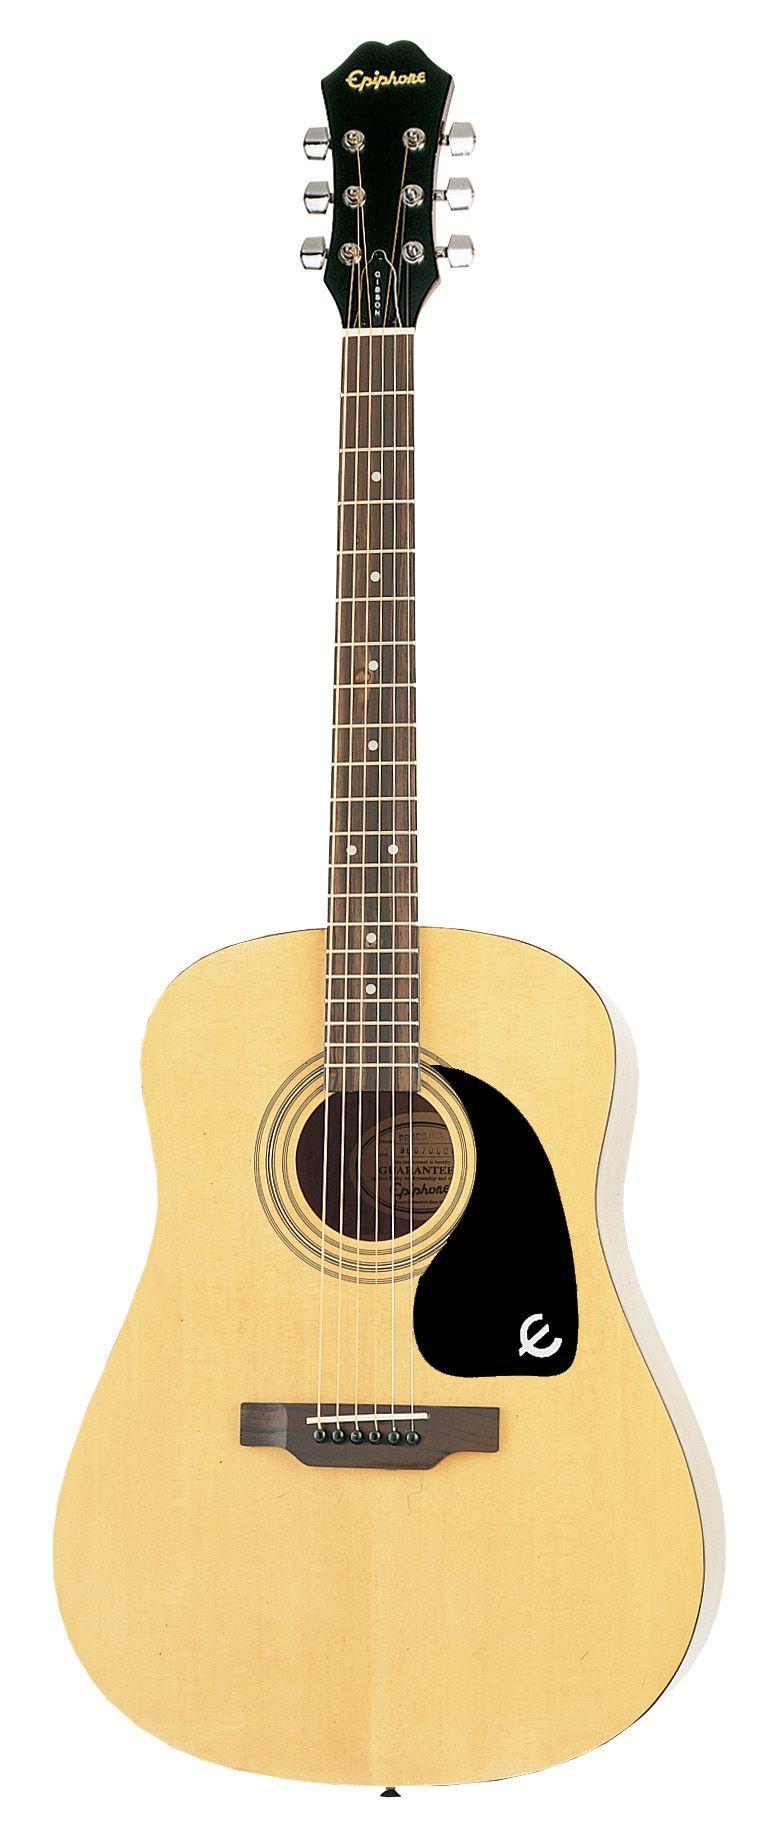 Epiphone Songmaker DR-100 Natural Akustikgitarre für Einsteiger